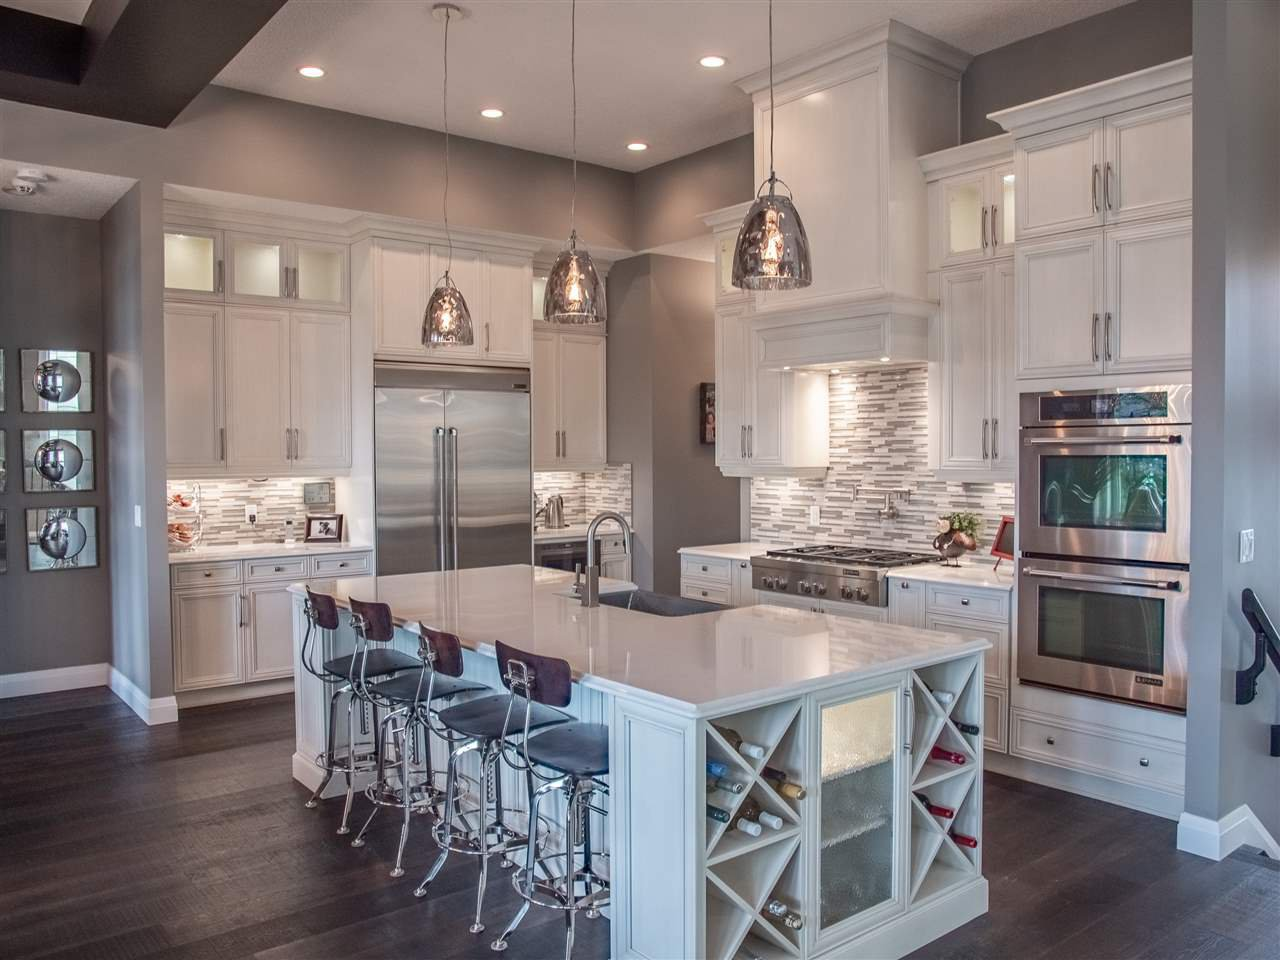 Photo 8: Photos: 58 Kenton Woods Lane NW: Spruce Grove House for sale : MLS®# E4166439